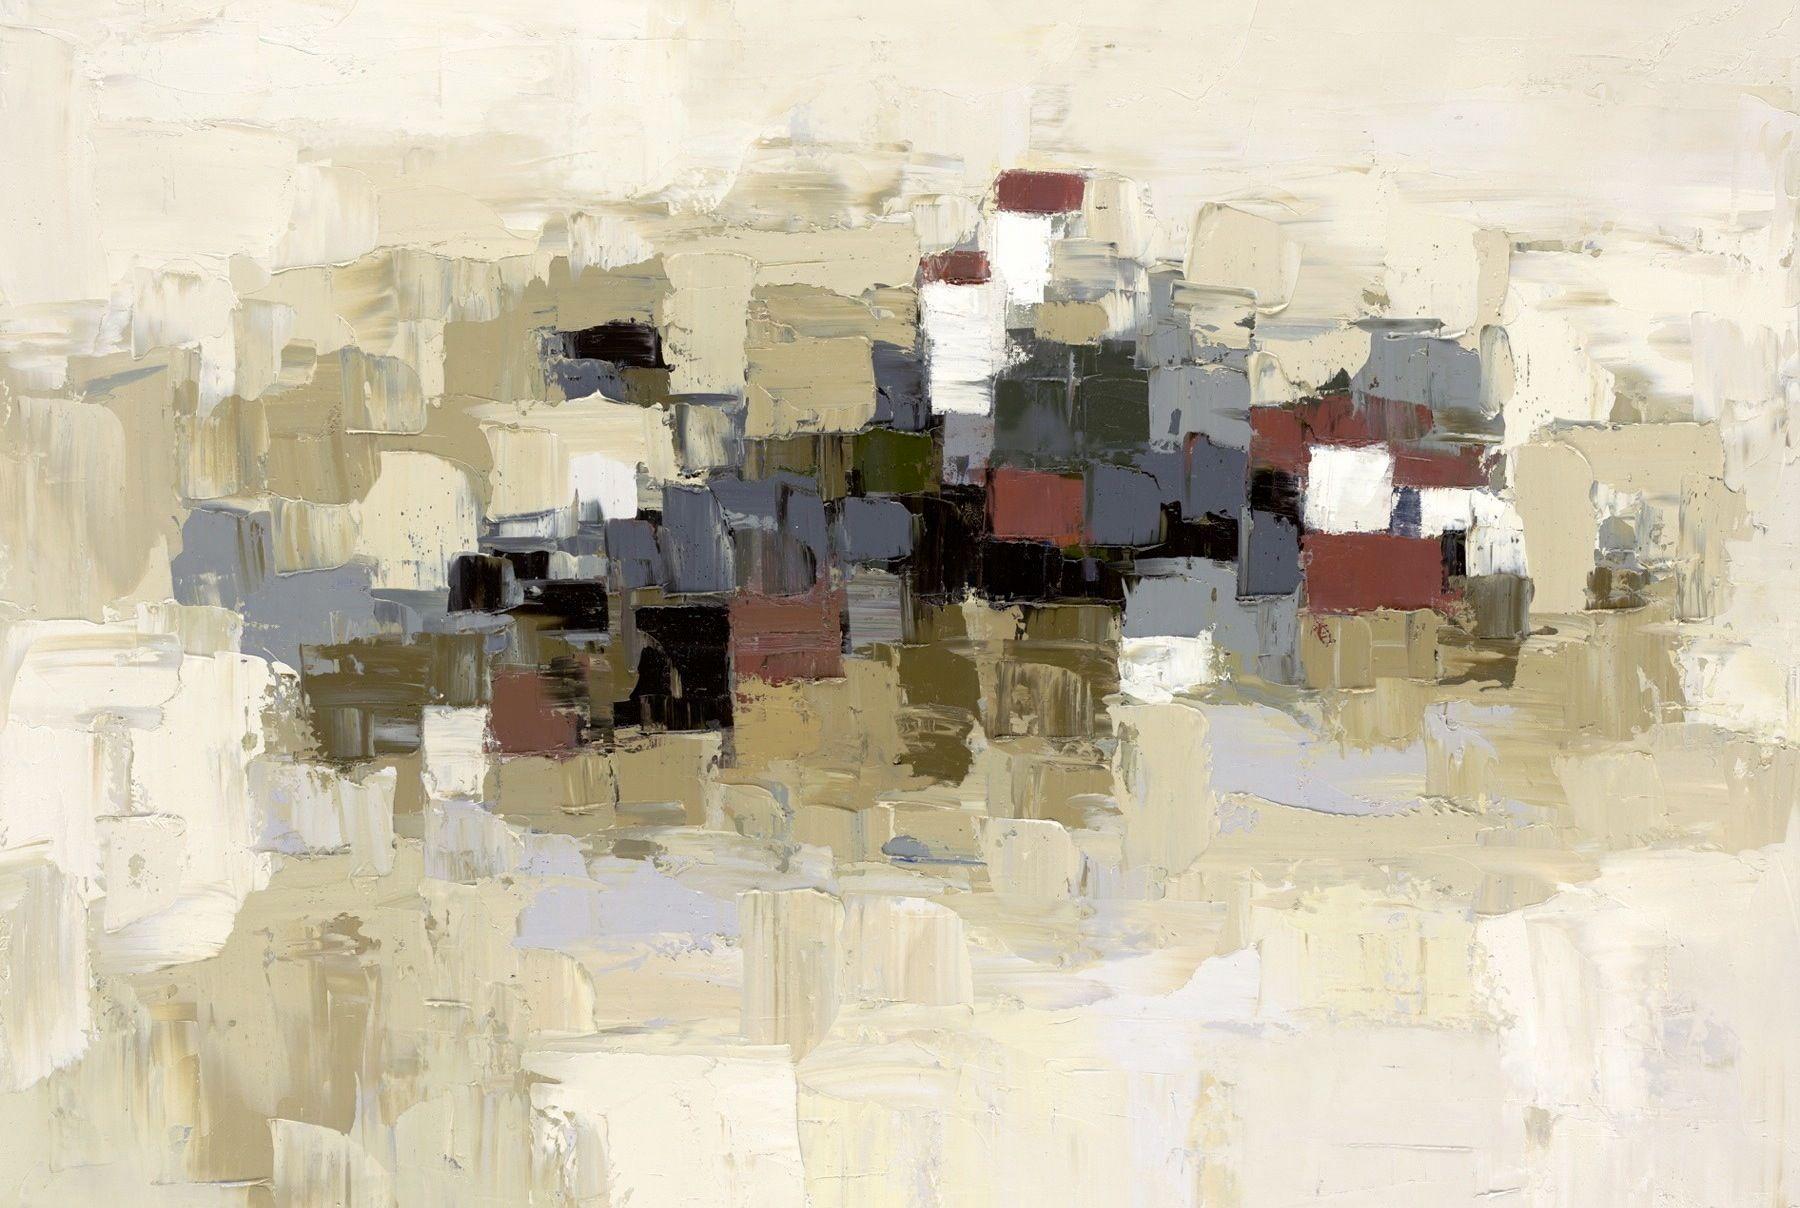 1scaler__0021_misty_village_oil_on_canvas_36x48.jpg